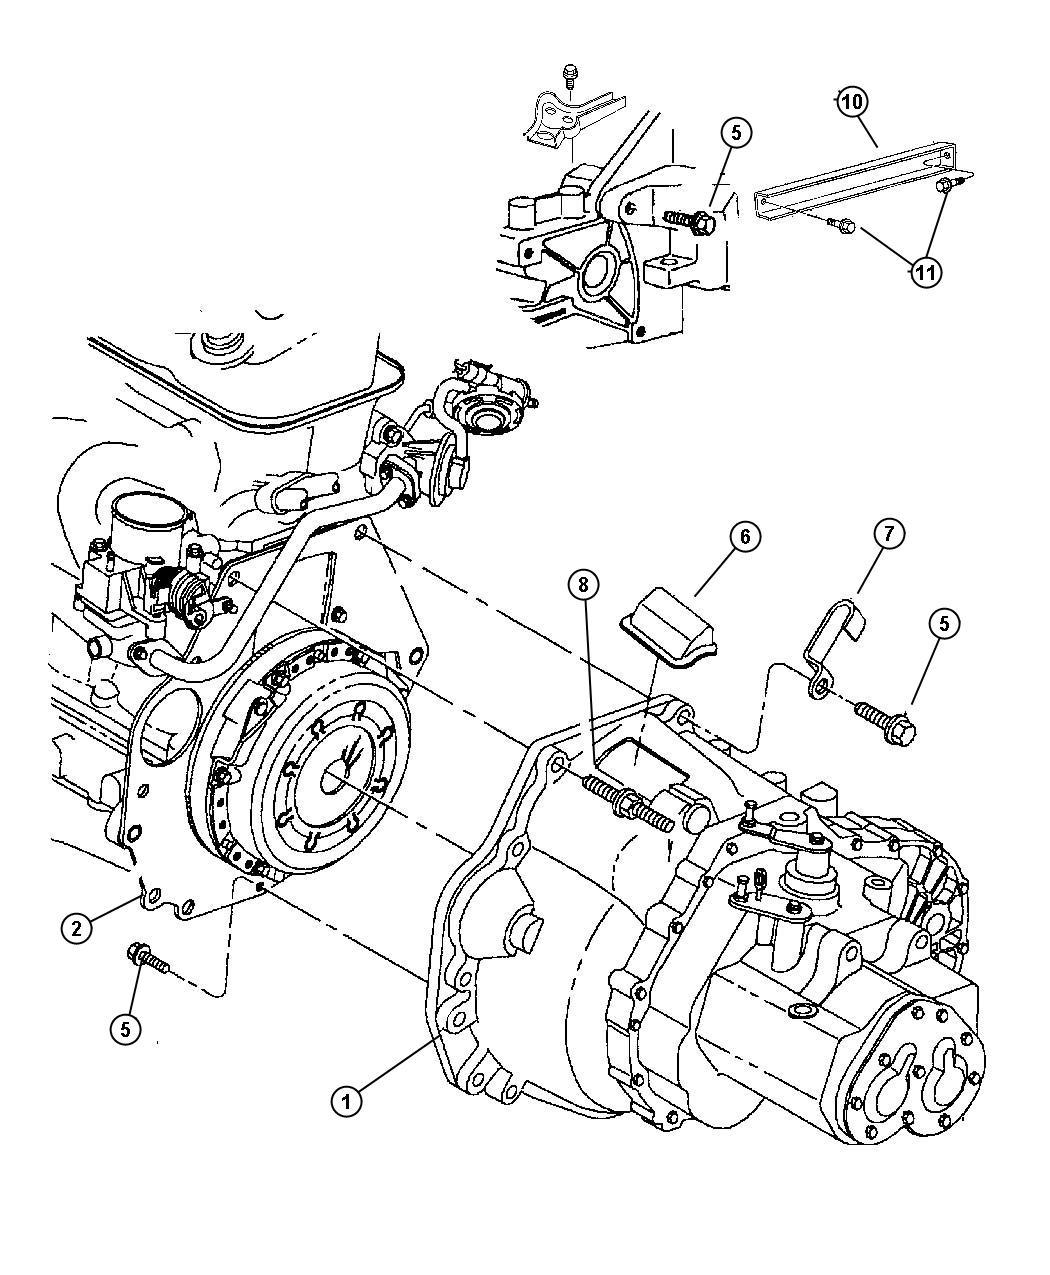 Chrysler PT Cruiser Transaxle. Mounting, overall, gear